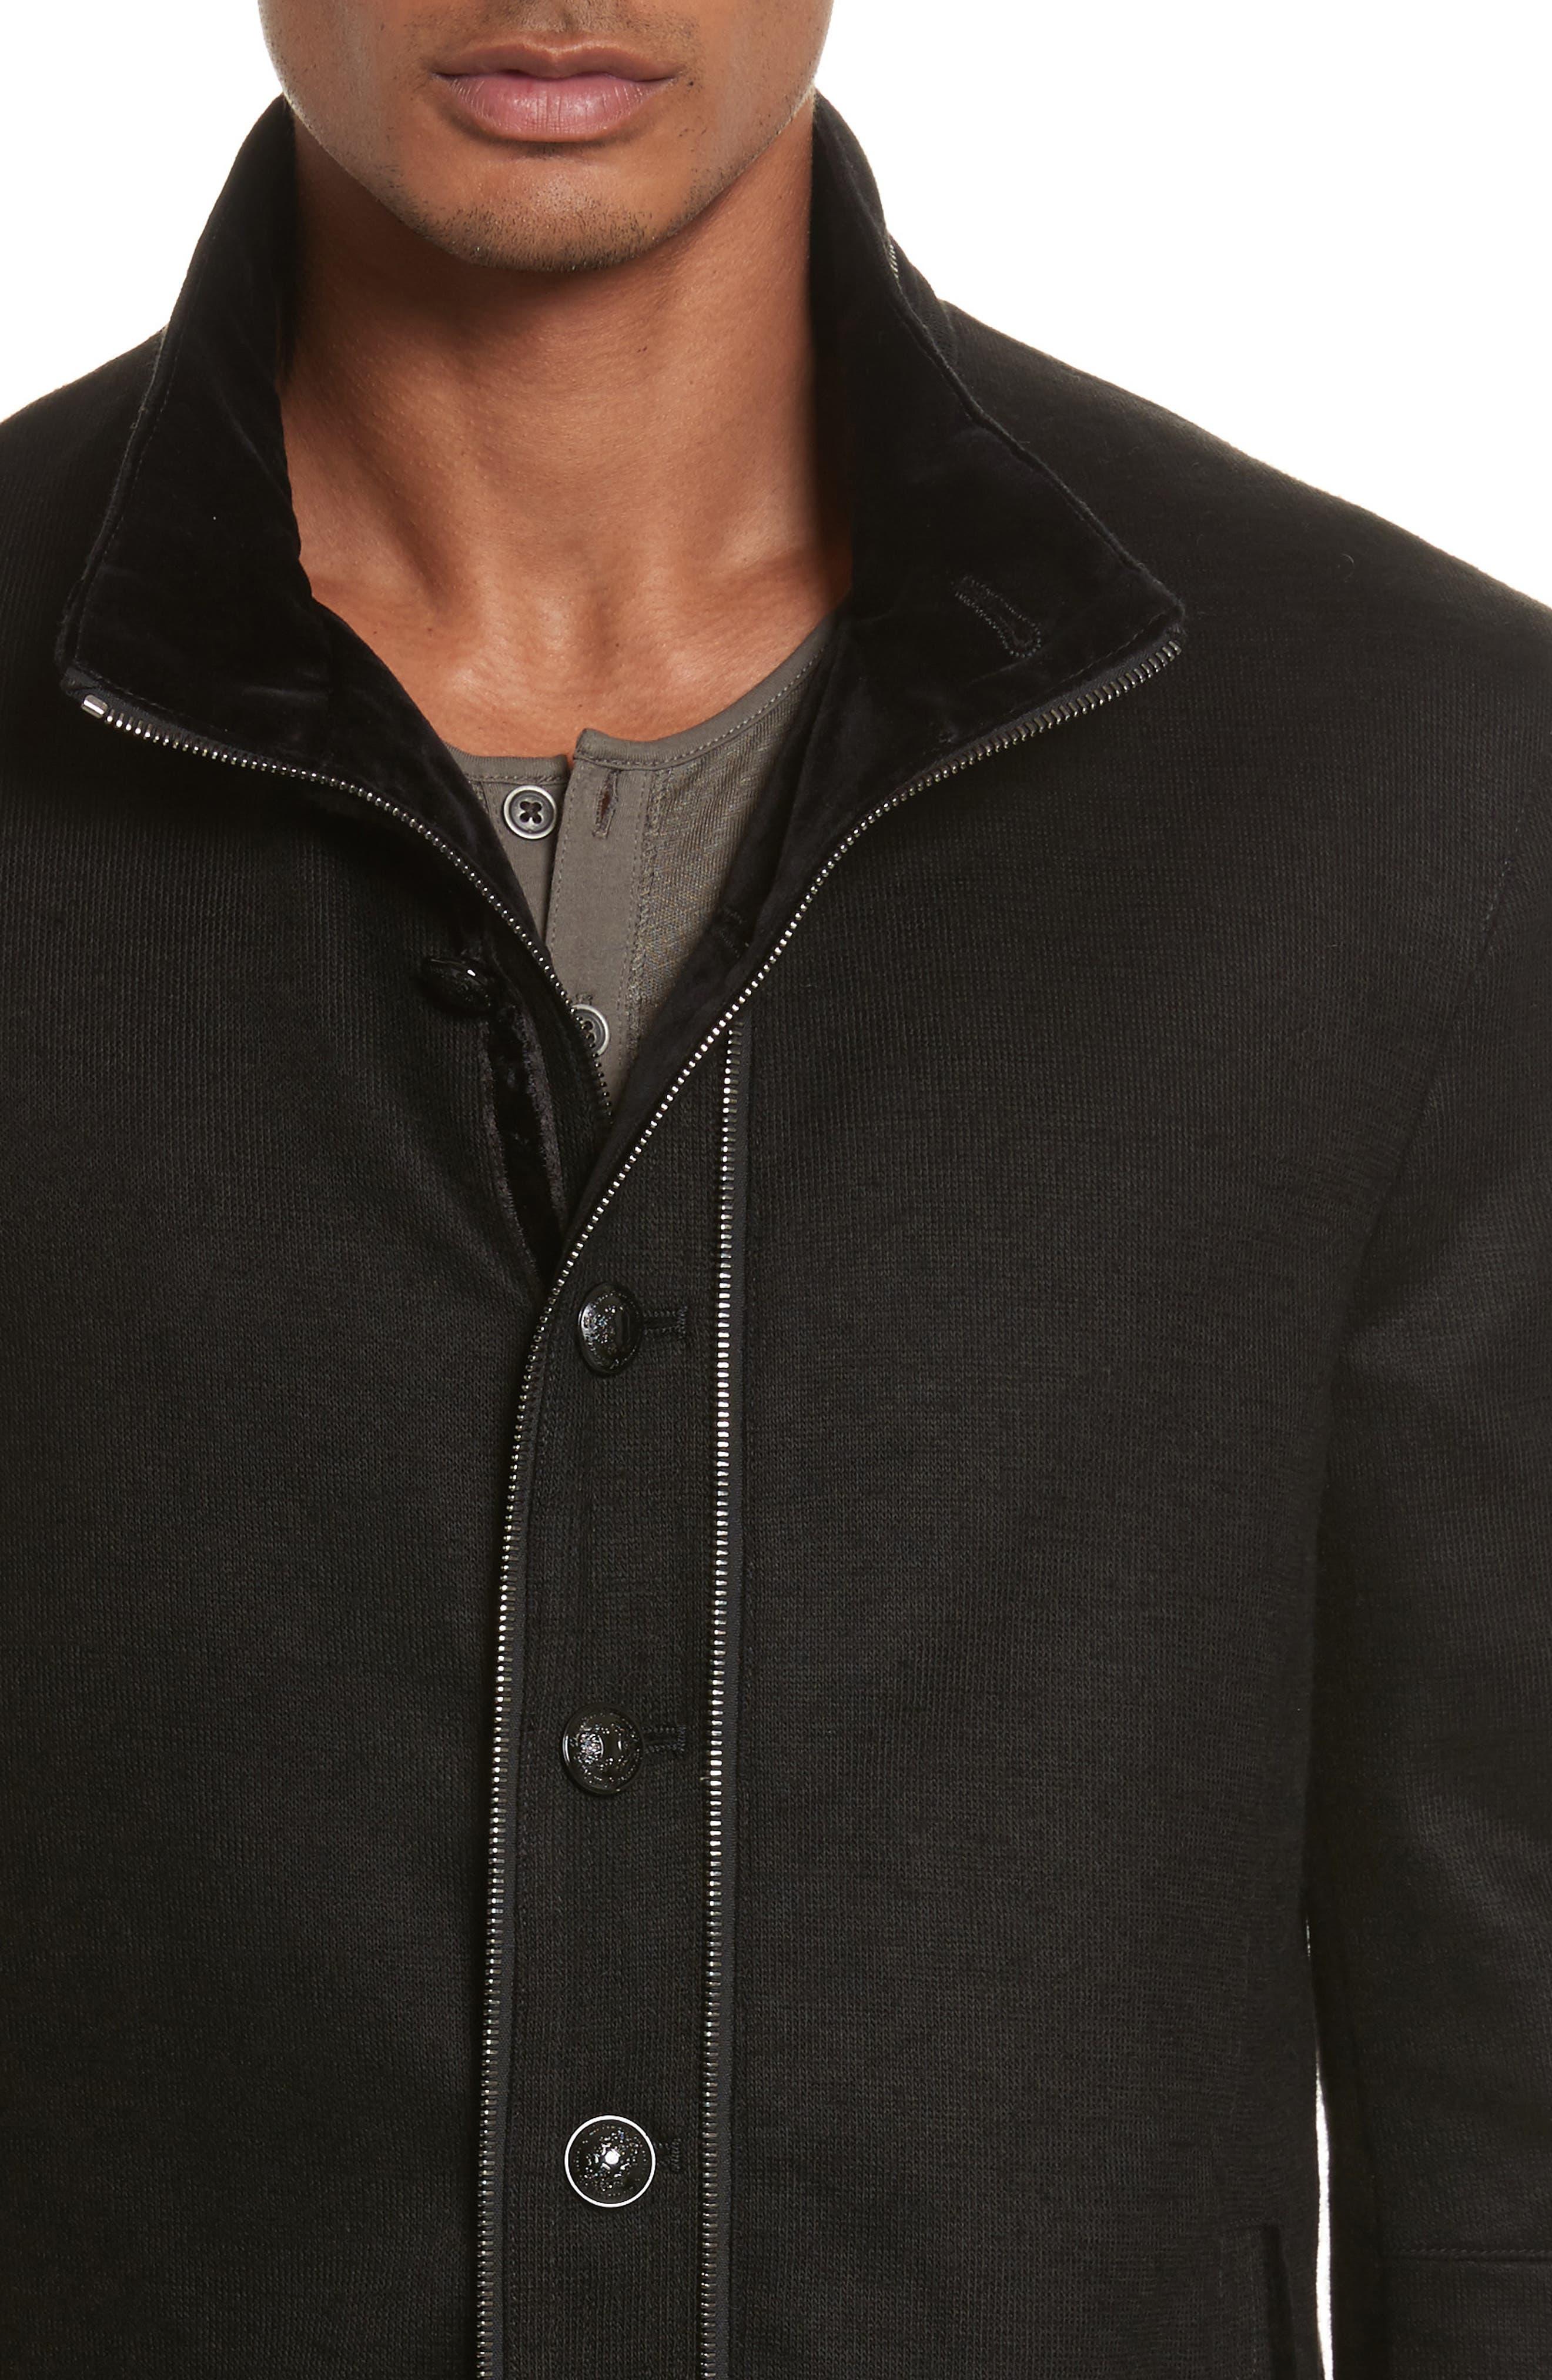 Cotton & Wool Jacket,                             Alternate thumbnail 4, color,                             001